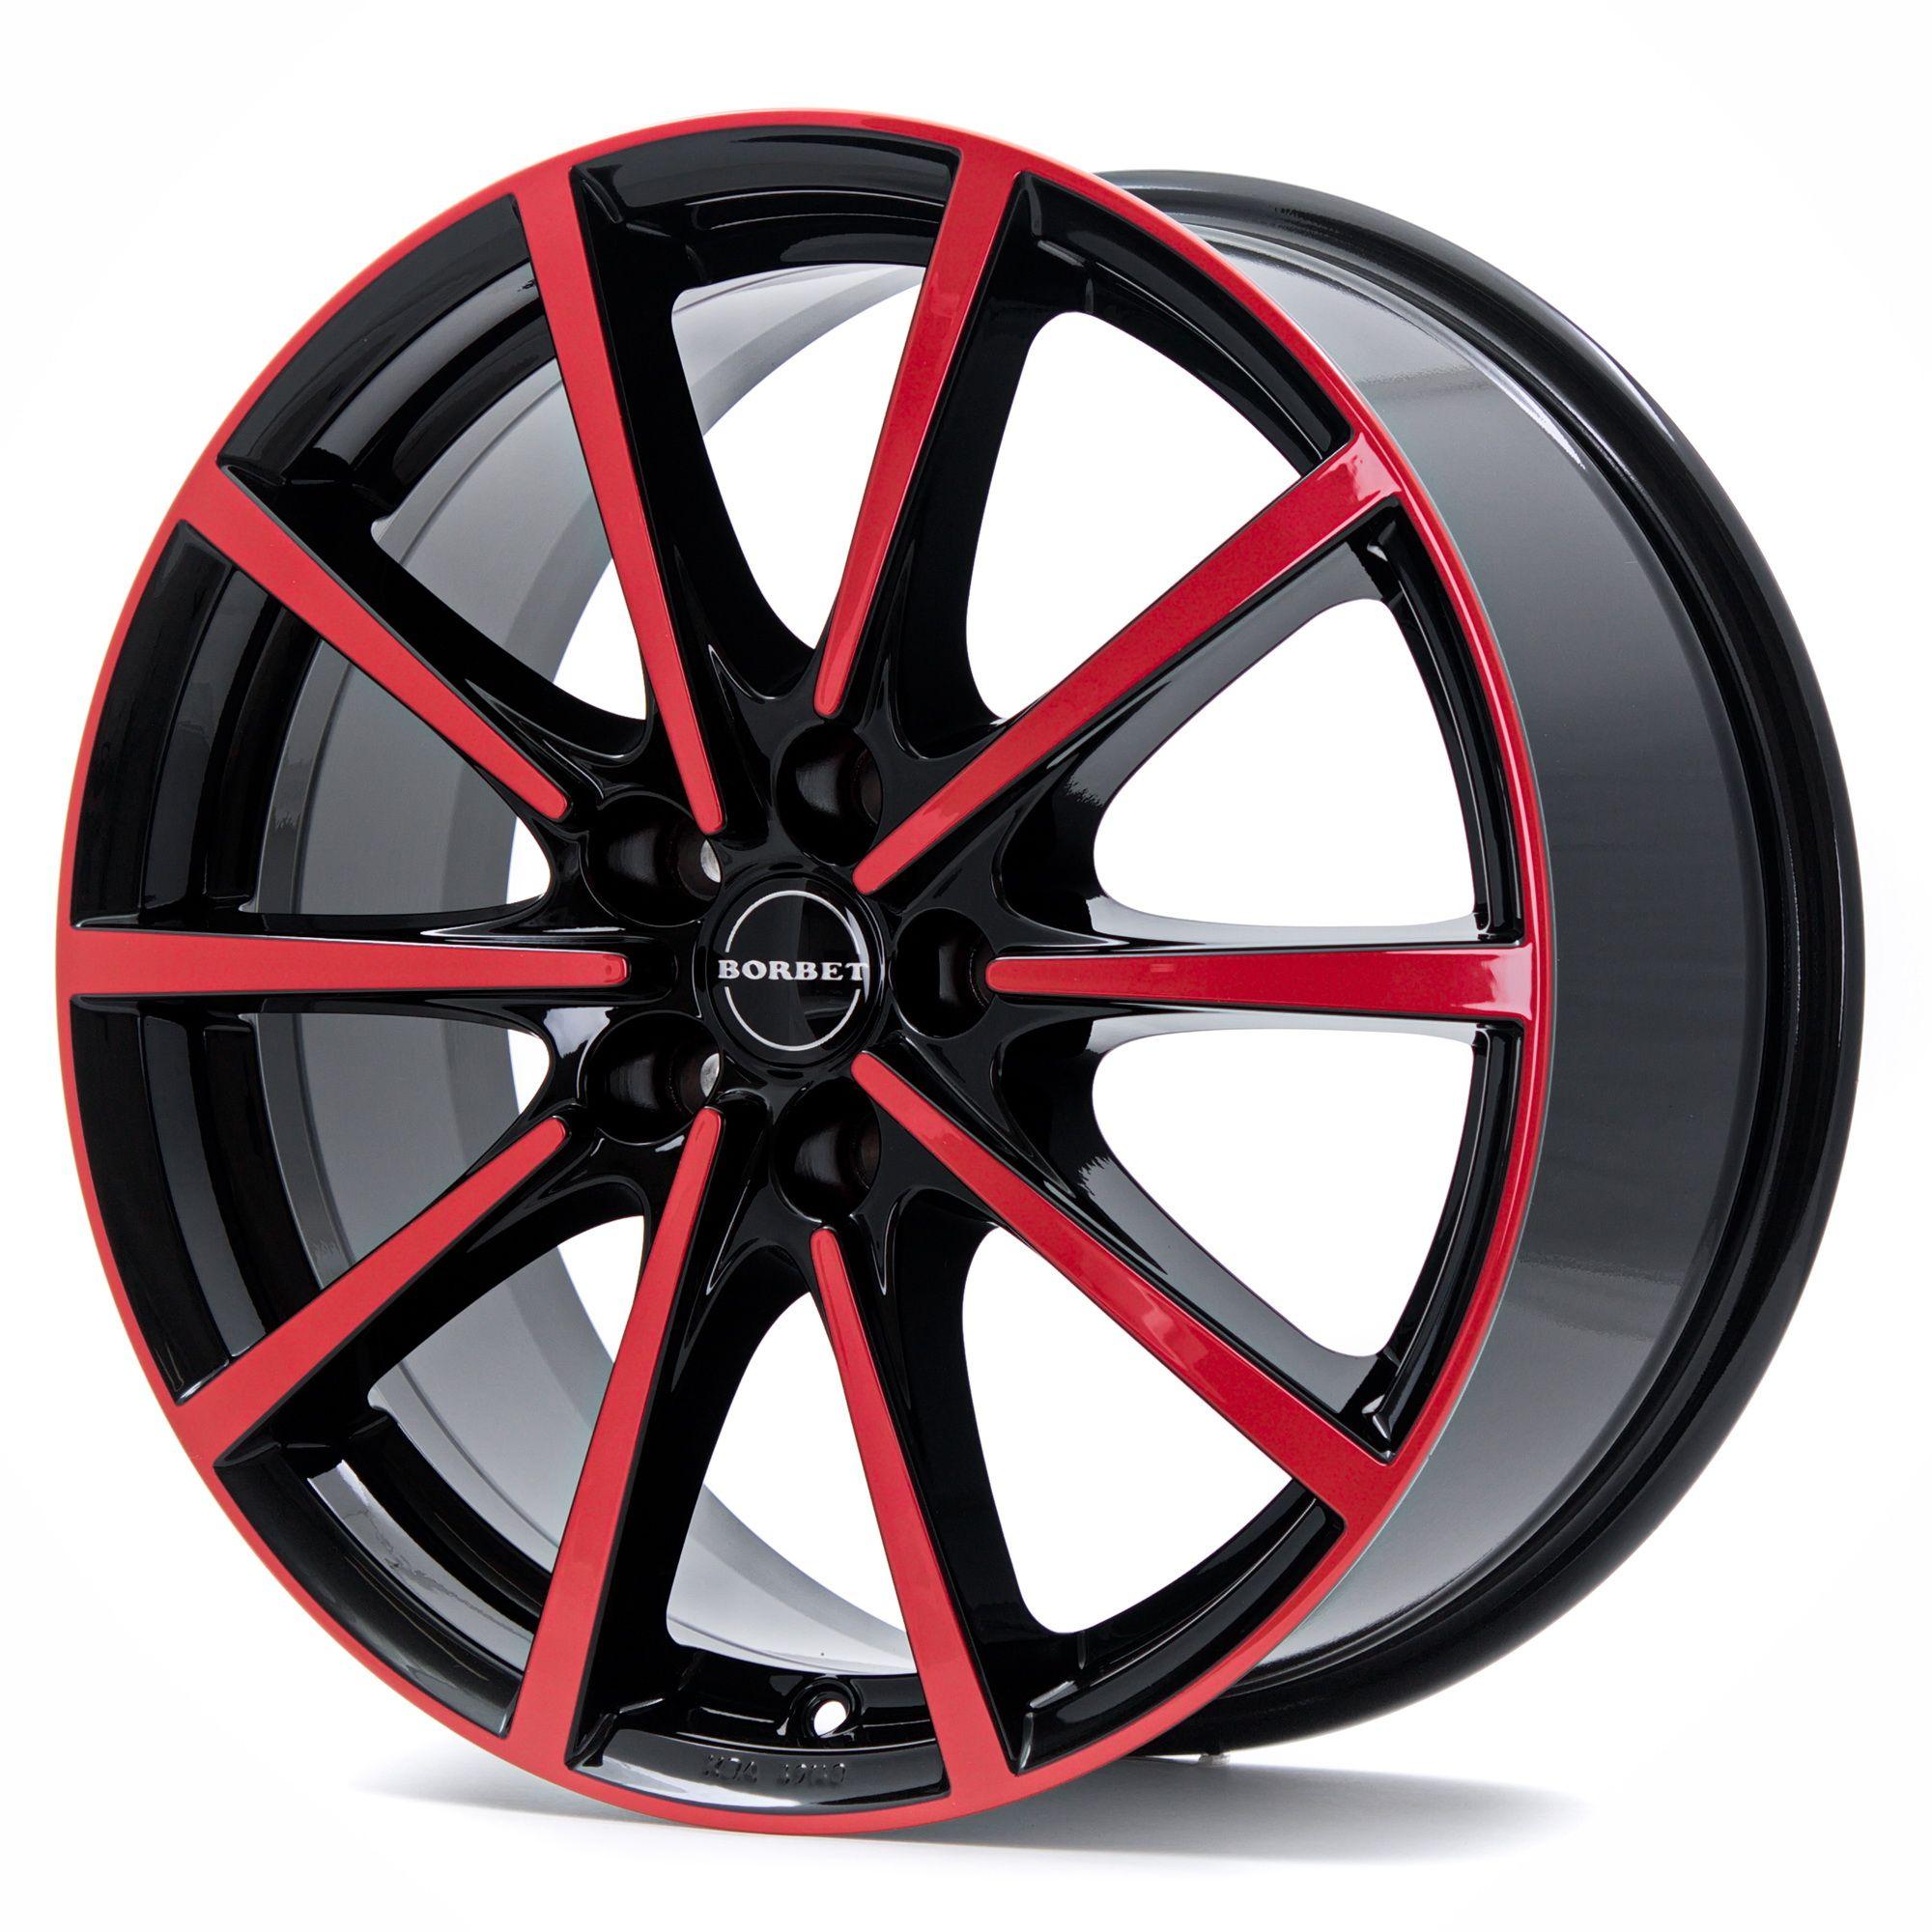 borbet bl5 felgen black red glossy in 18 zoll. Black Bedroom Furniture Sets. Home Design Ideas